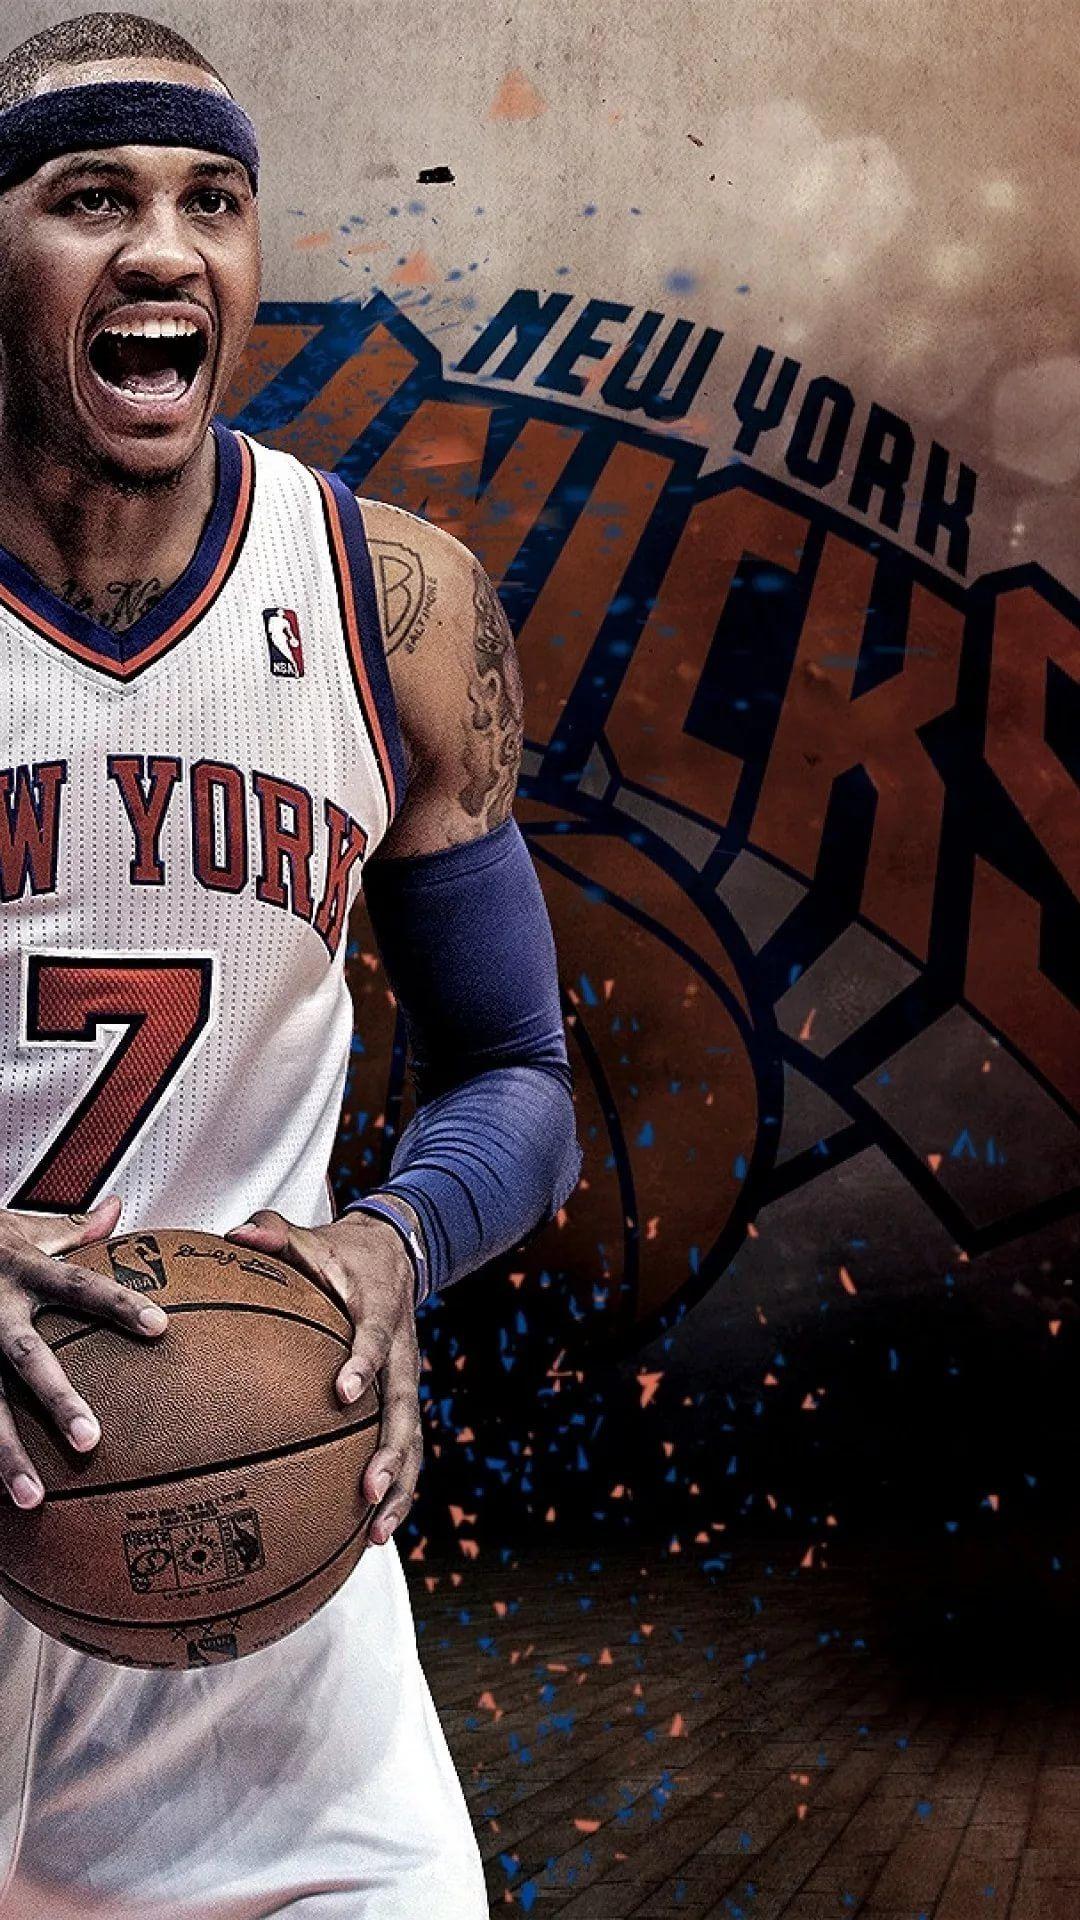 New York Knicks iPhone 7 wallpaper